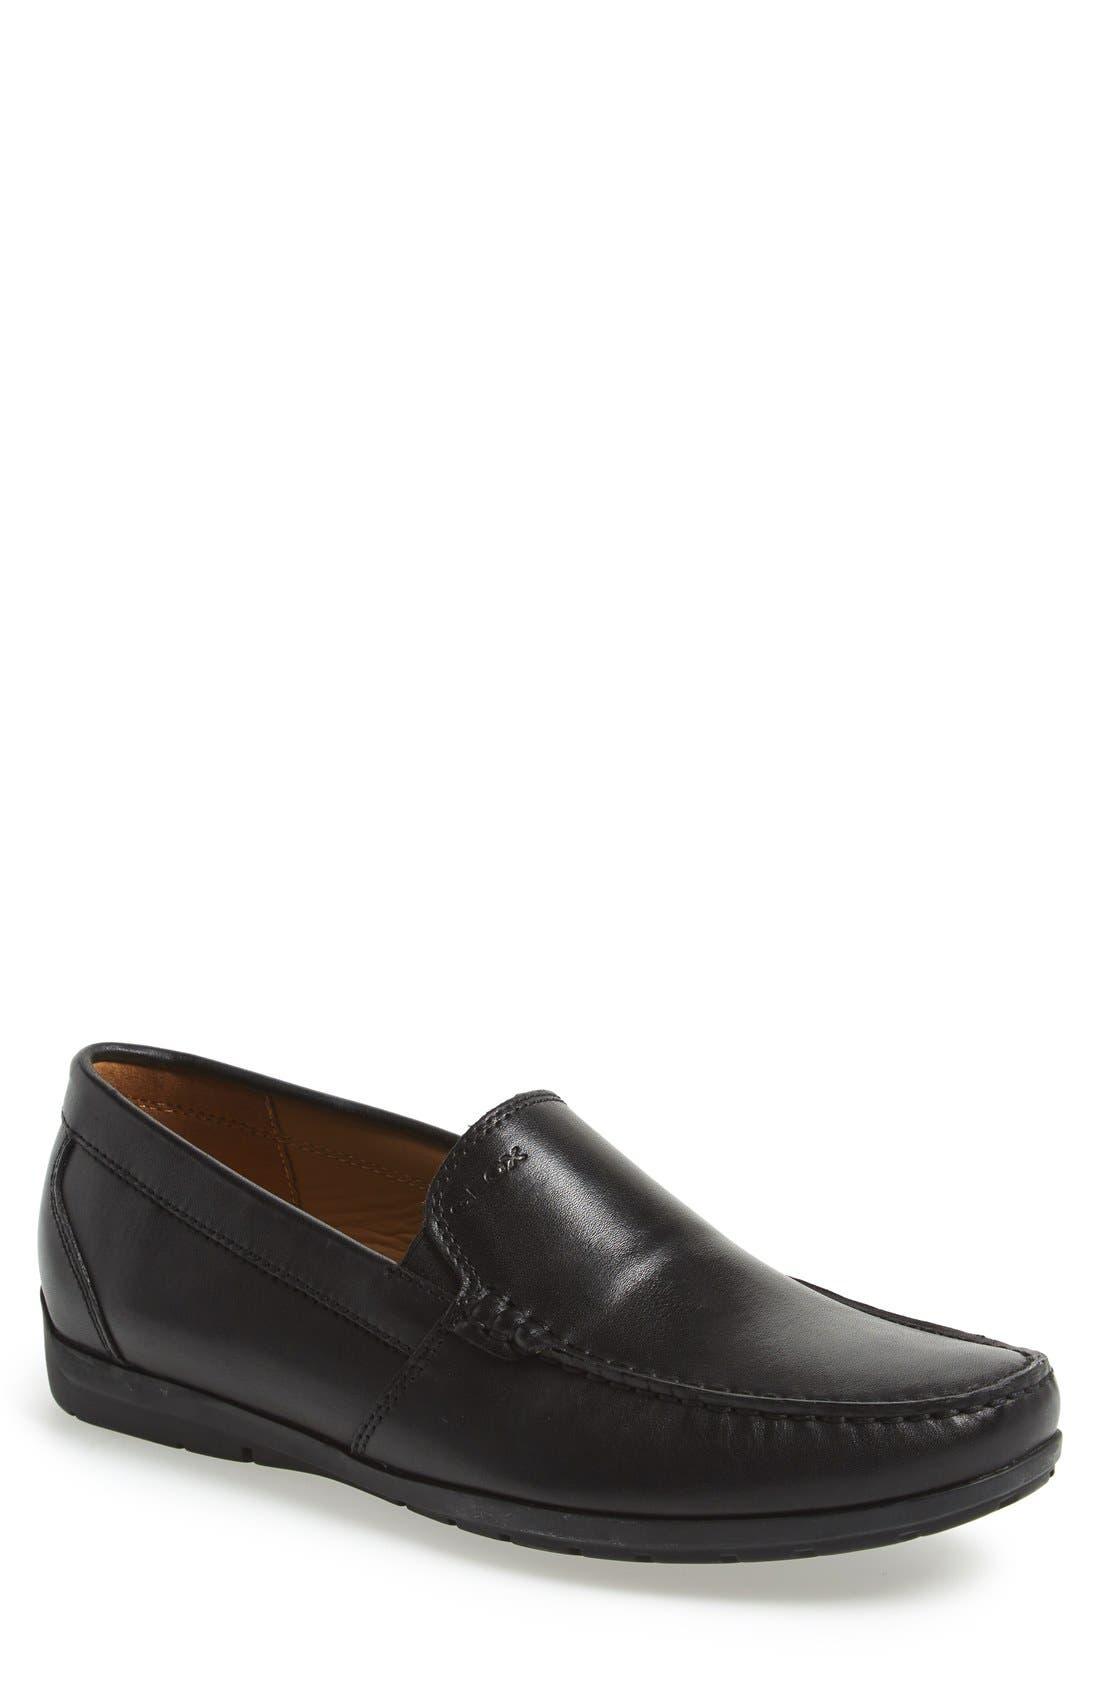 'Simon W2' Venetian Loafer,                             Main thumbnail 1, color,                             BLACK